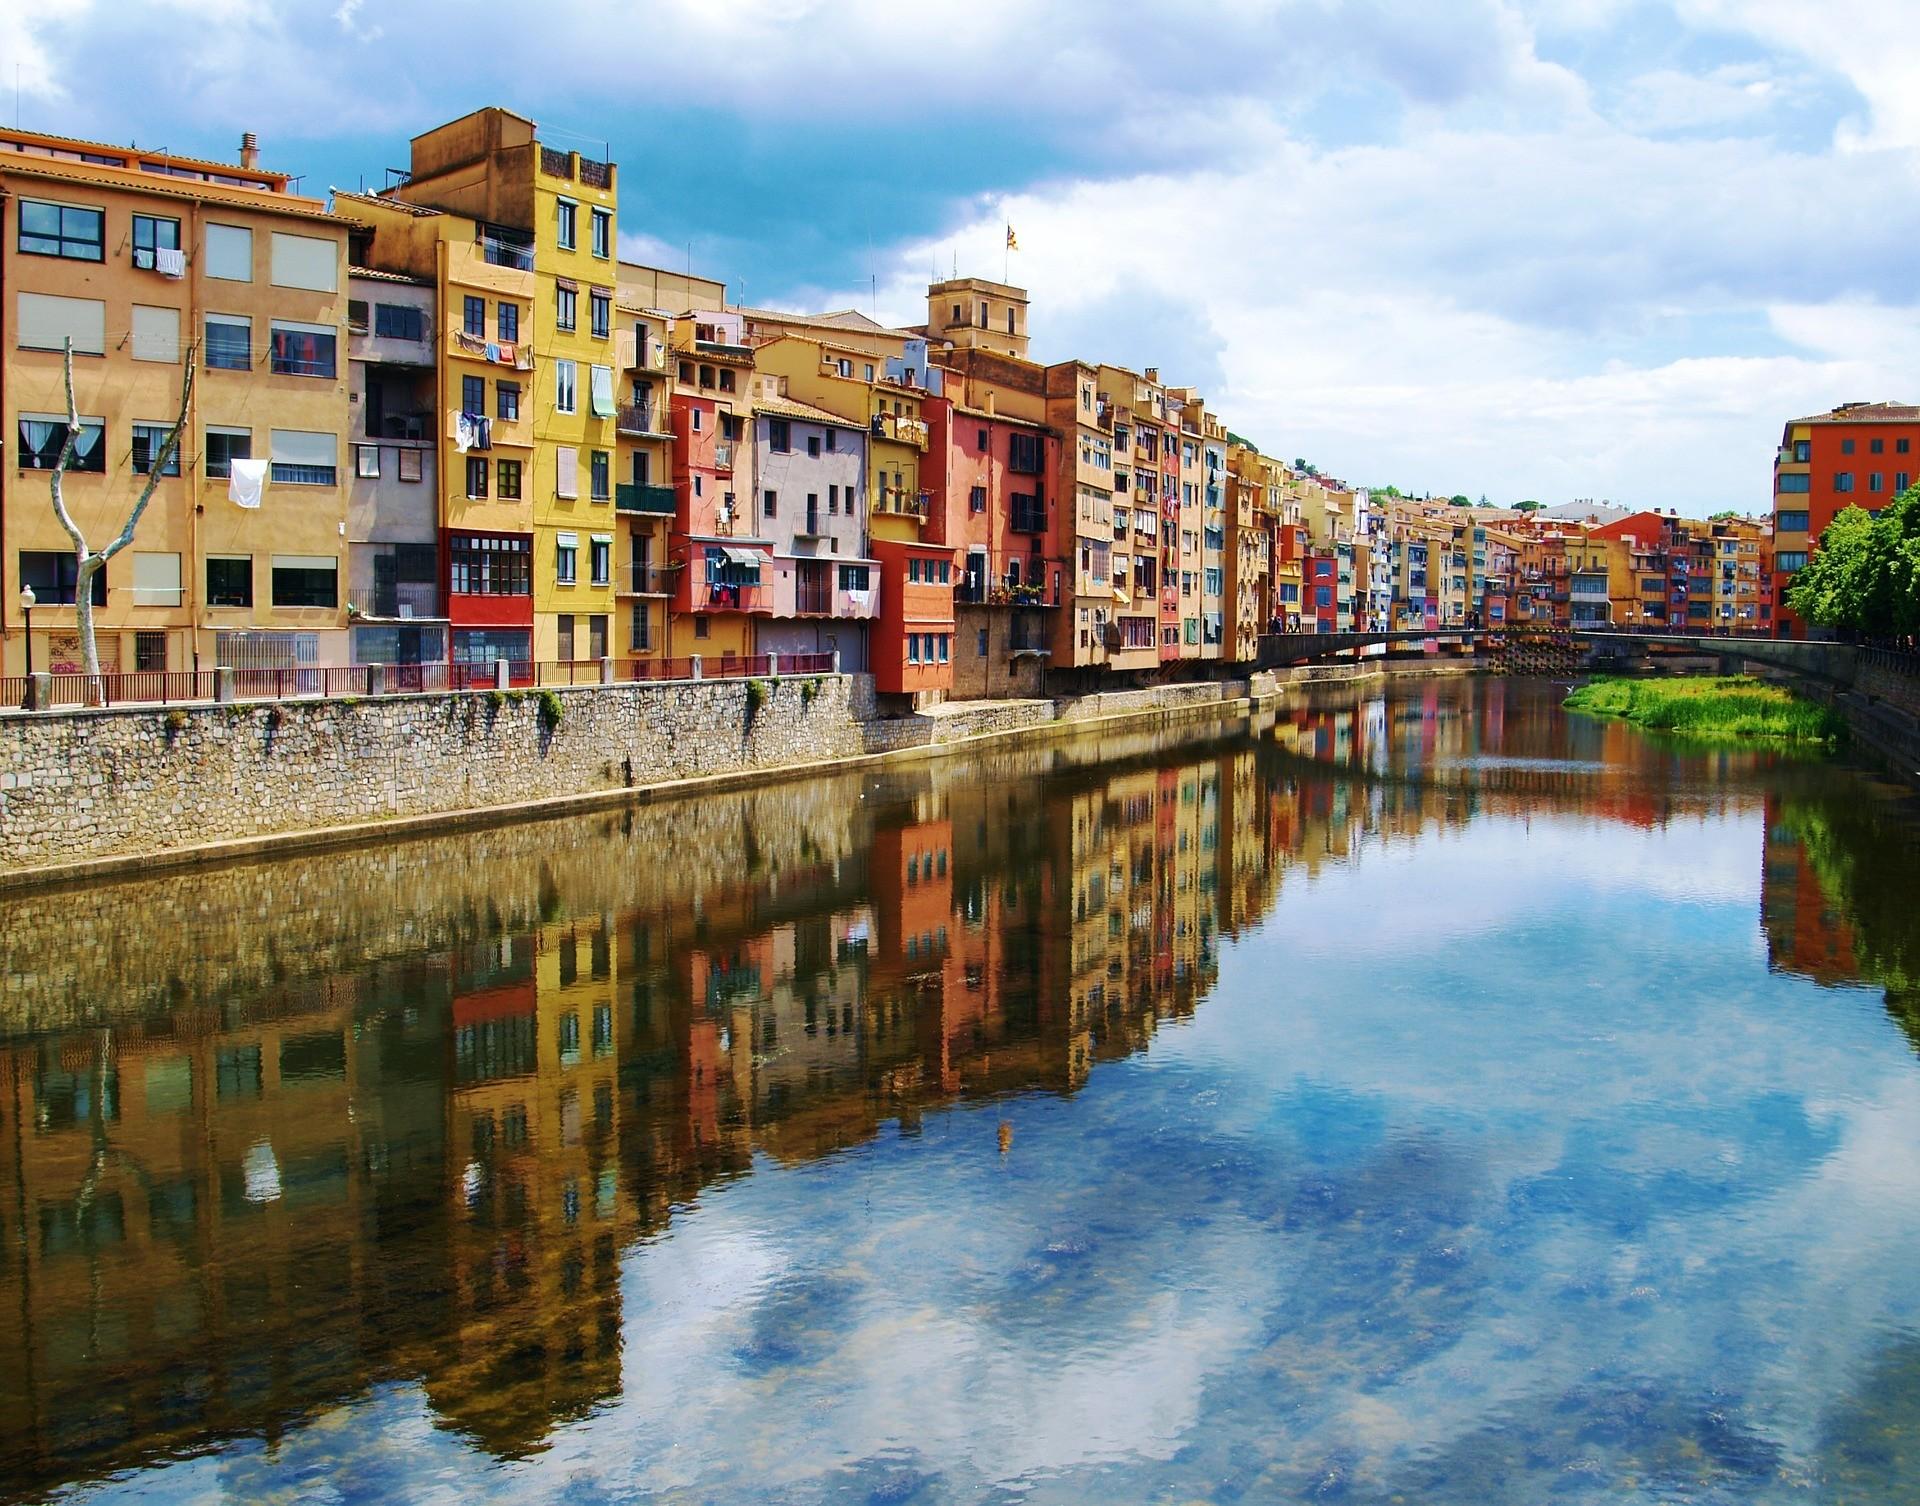 Girona, Catalogna - Foto di Tibor Janosi Mozes